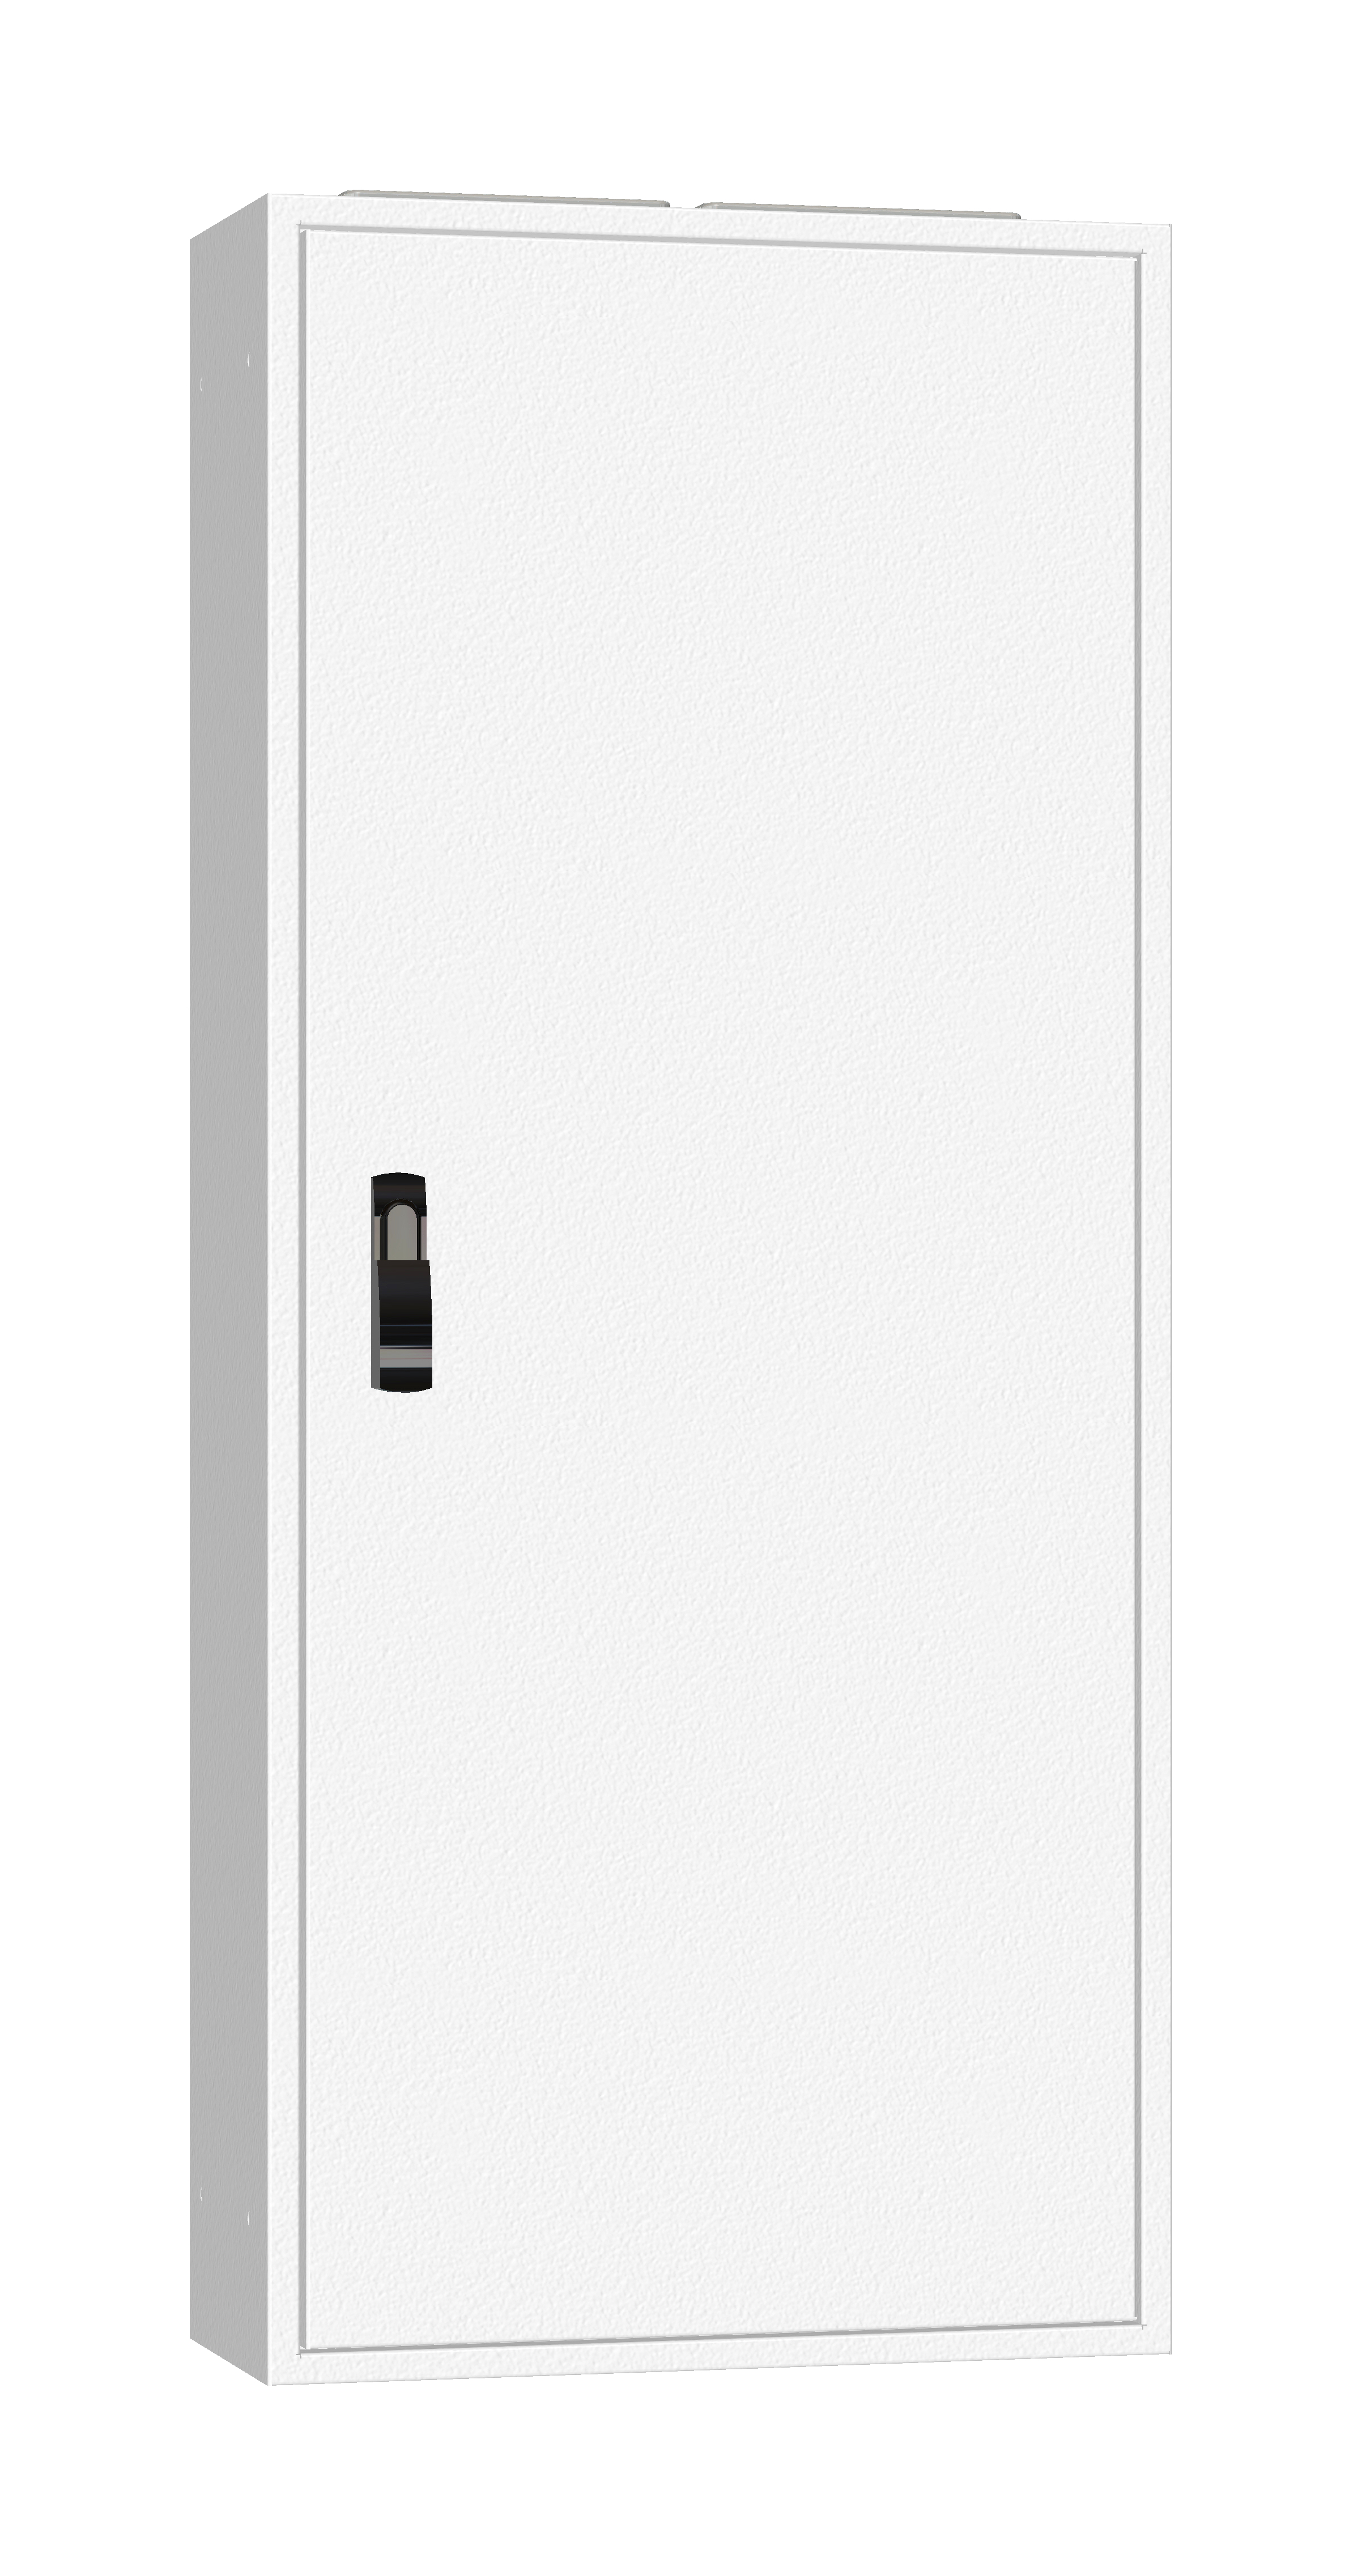 1 Stk AP-Rahmen + Tür 2A-28 T=250mm, Rückwand + Schwenkhebel, IP54 IL952228--